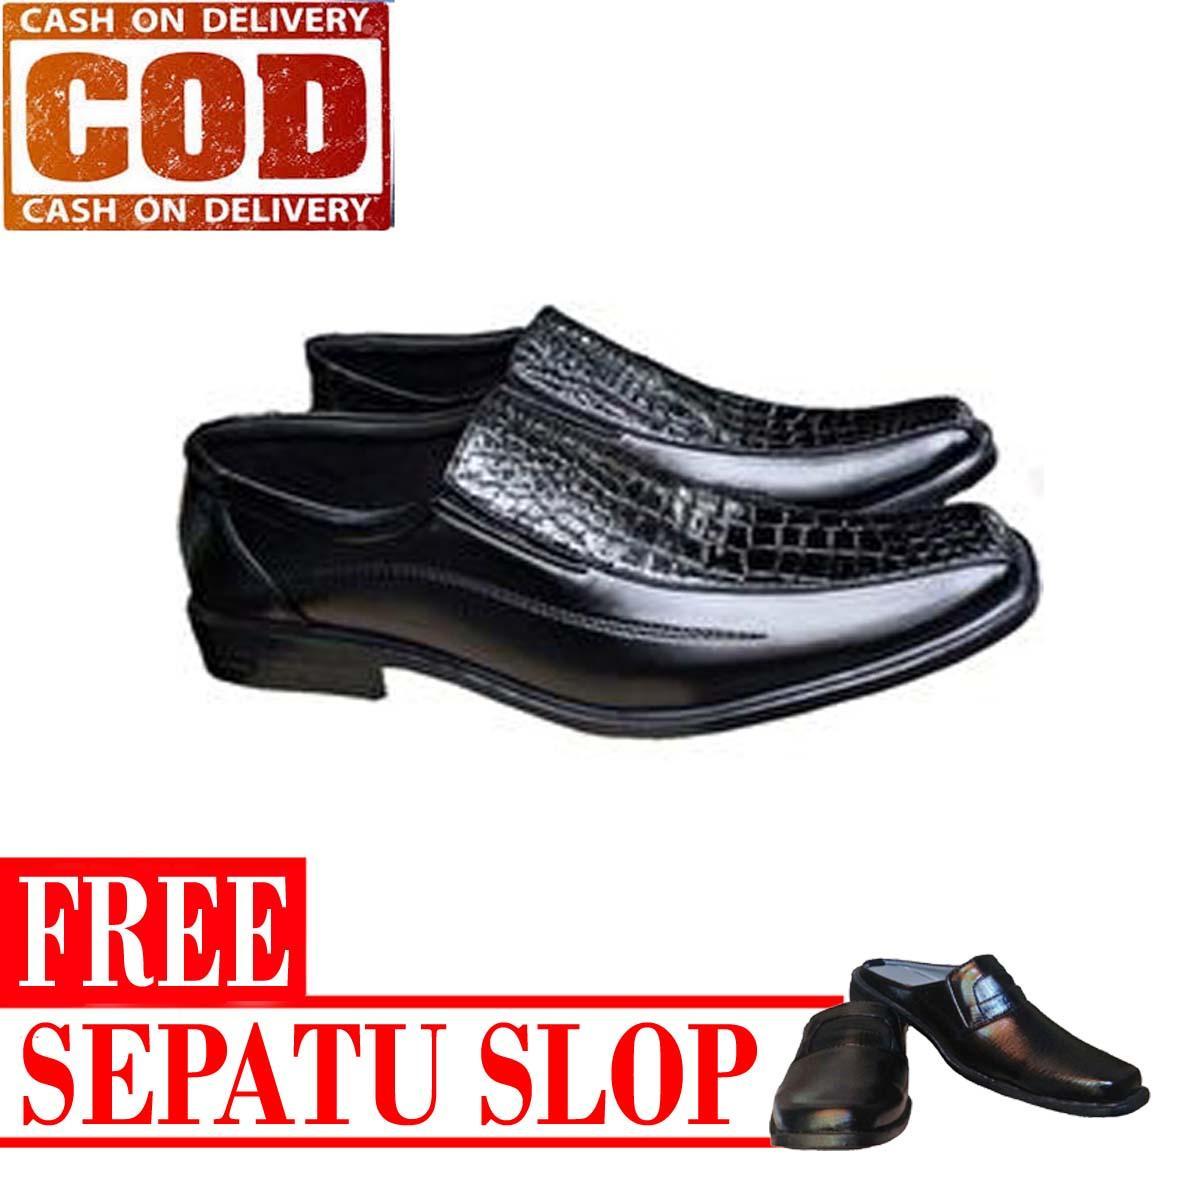 Sepatu Kulit Pria Pantofel Formal Kerja Kantor Kombinasi Kulit Buaya Free Sepatu Slop - Hitam